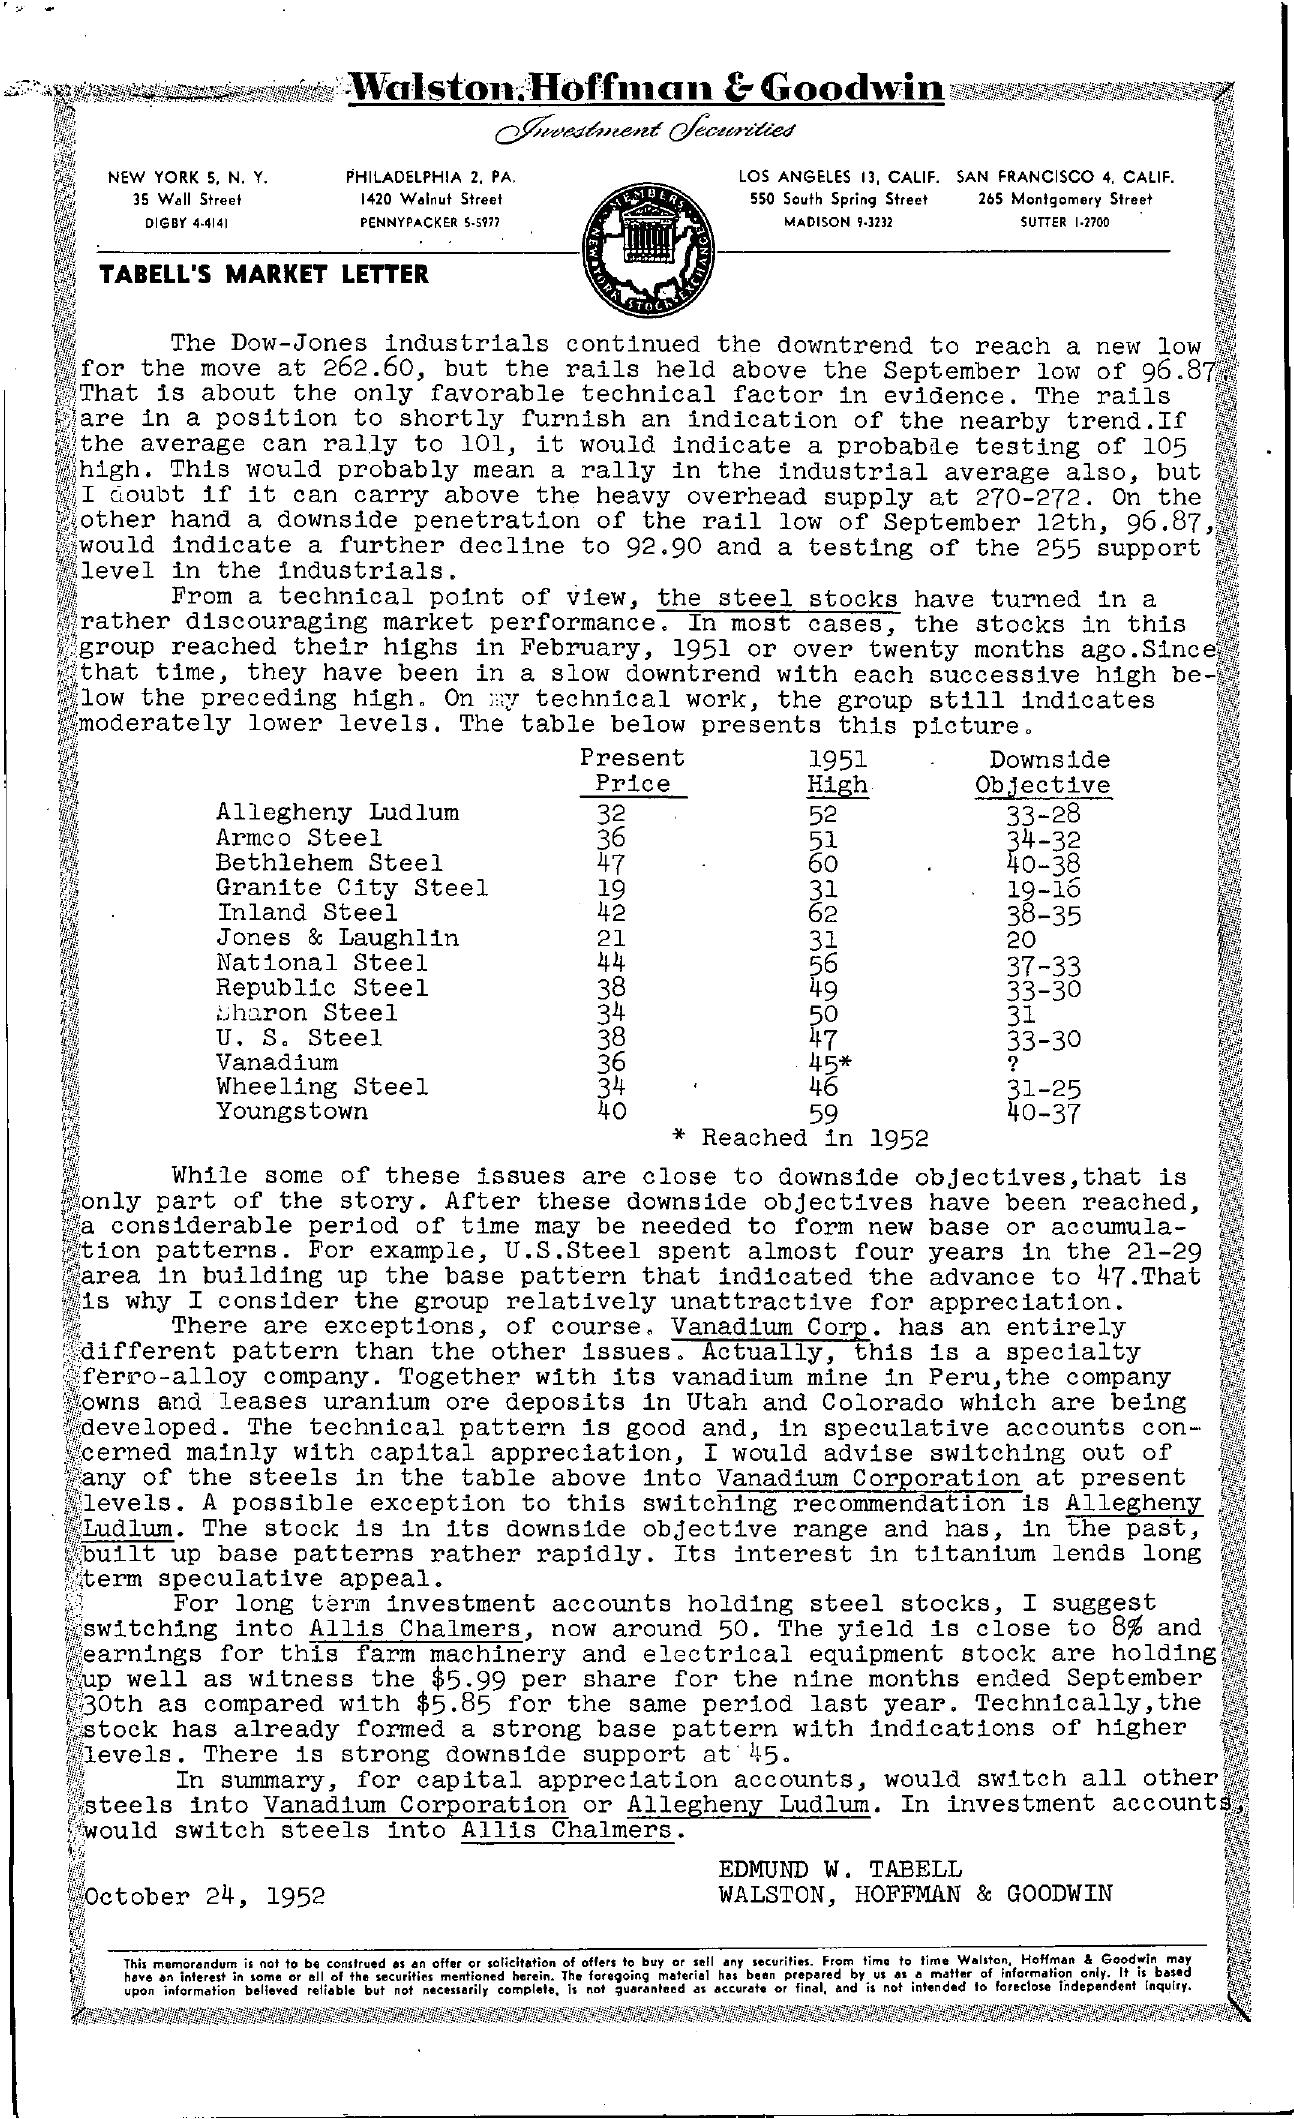 Tabell's Market Letter - October 24, 1952